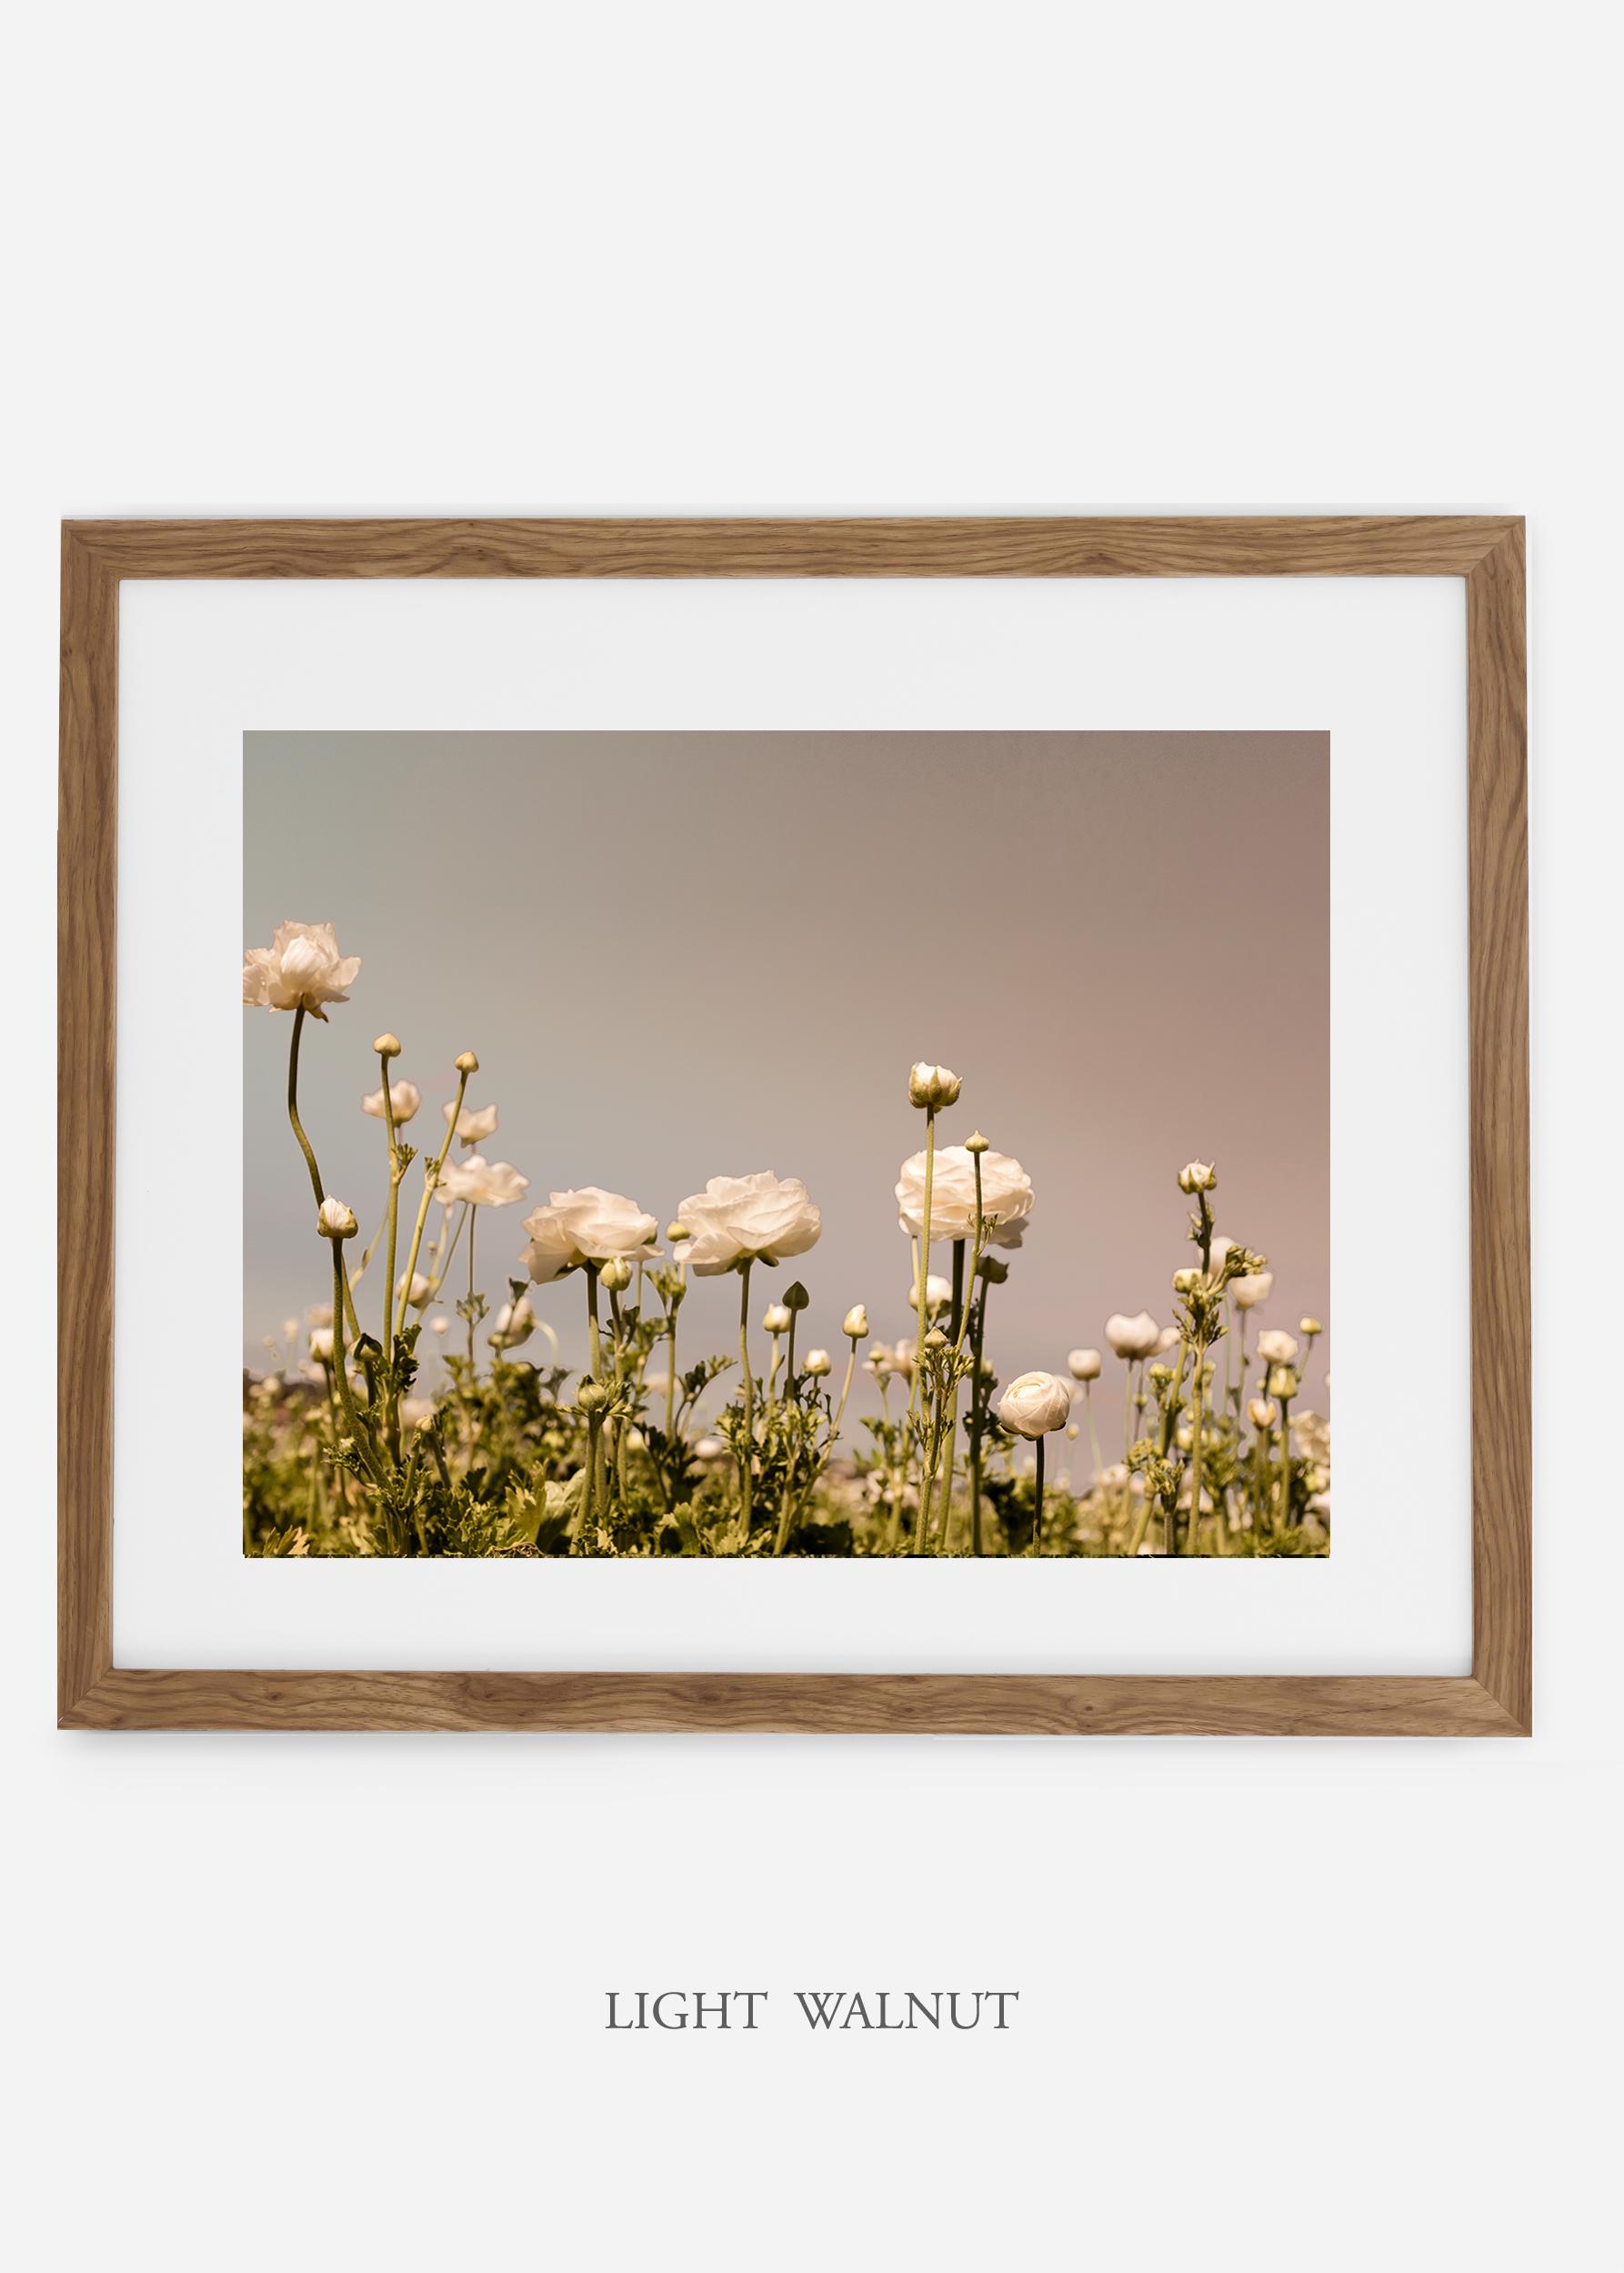 NoMat-Light-Walnut-Frame-flora-6-Wilder-California-Art-Floral-Home-decor-Prints-Dahlia-Botanical-Artwork-Interior-design.jpg